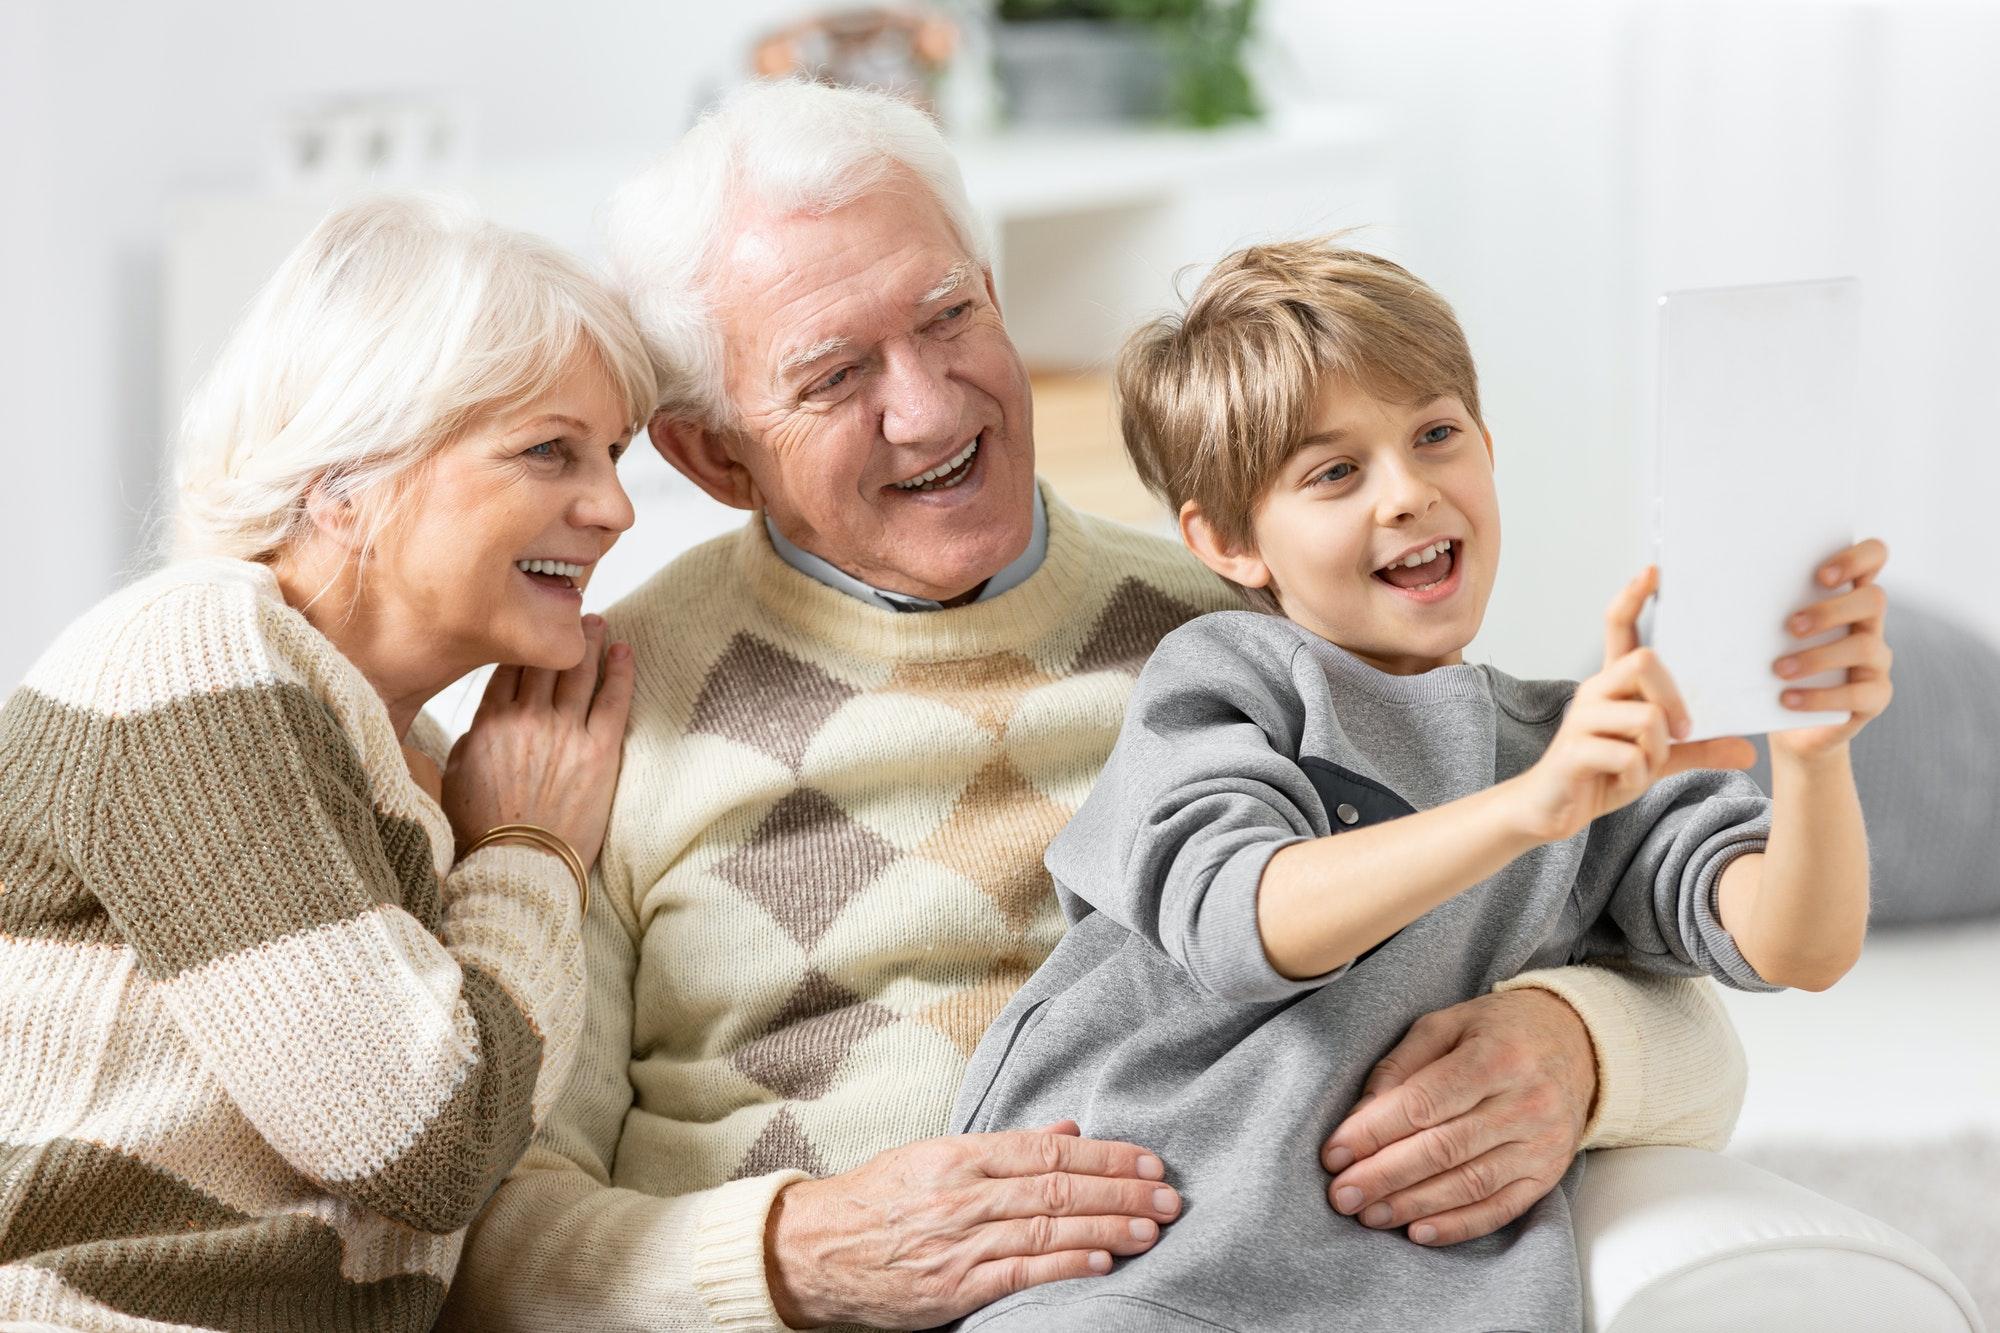 Smiling grandson taking selfie of himself and his happy grandpar